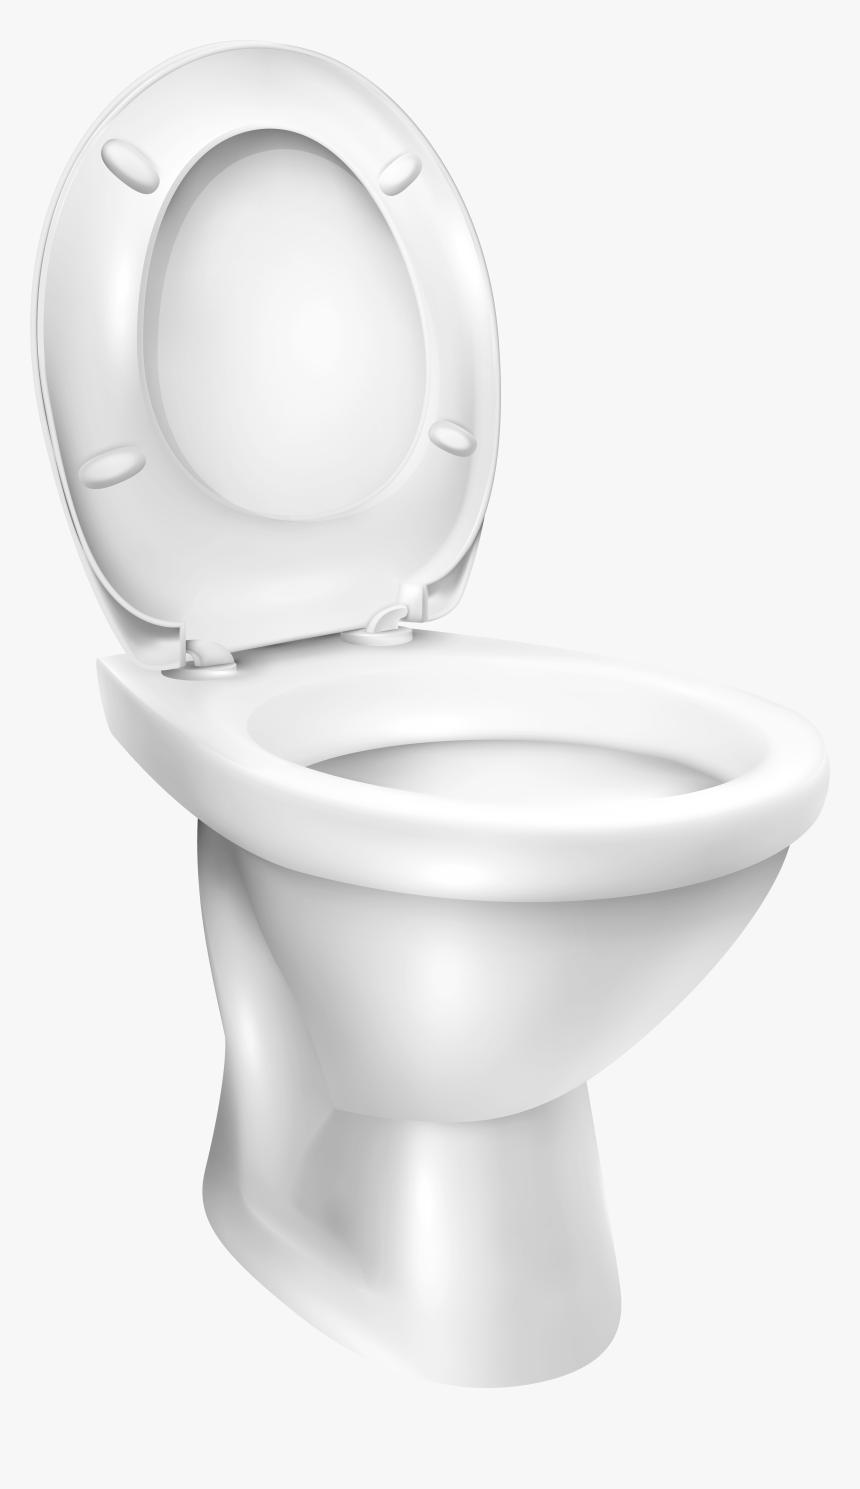 Toilet Bowl Png Clip Art - Toilet Bowl Png, Transparent Png, Free Download